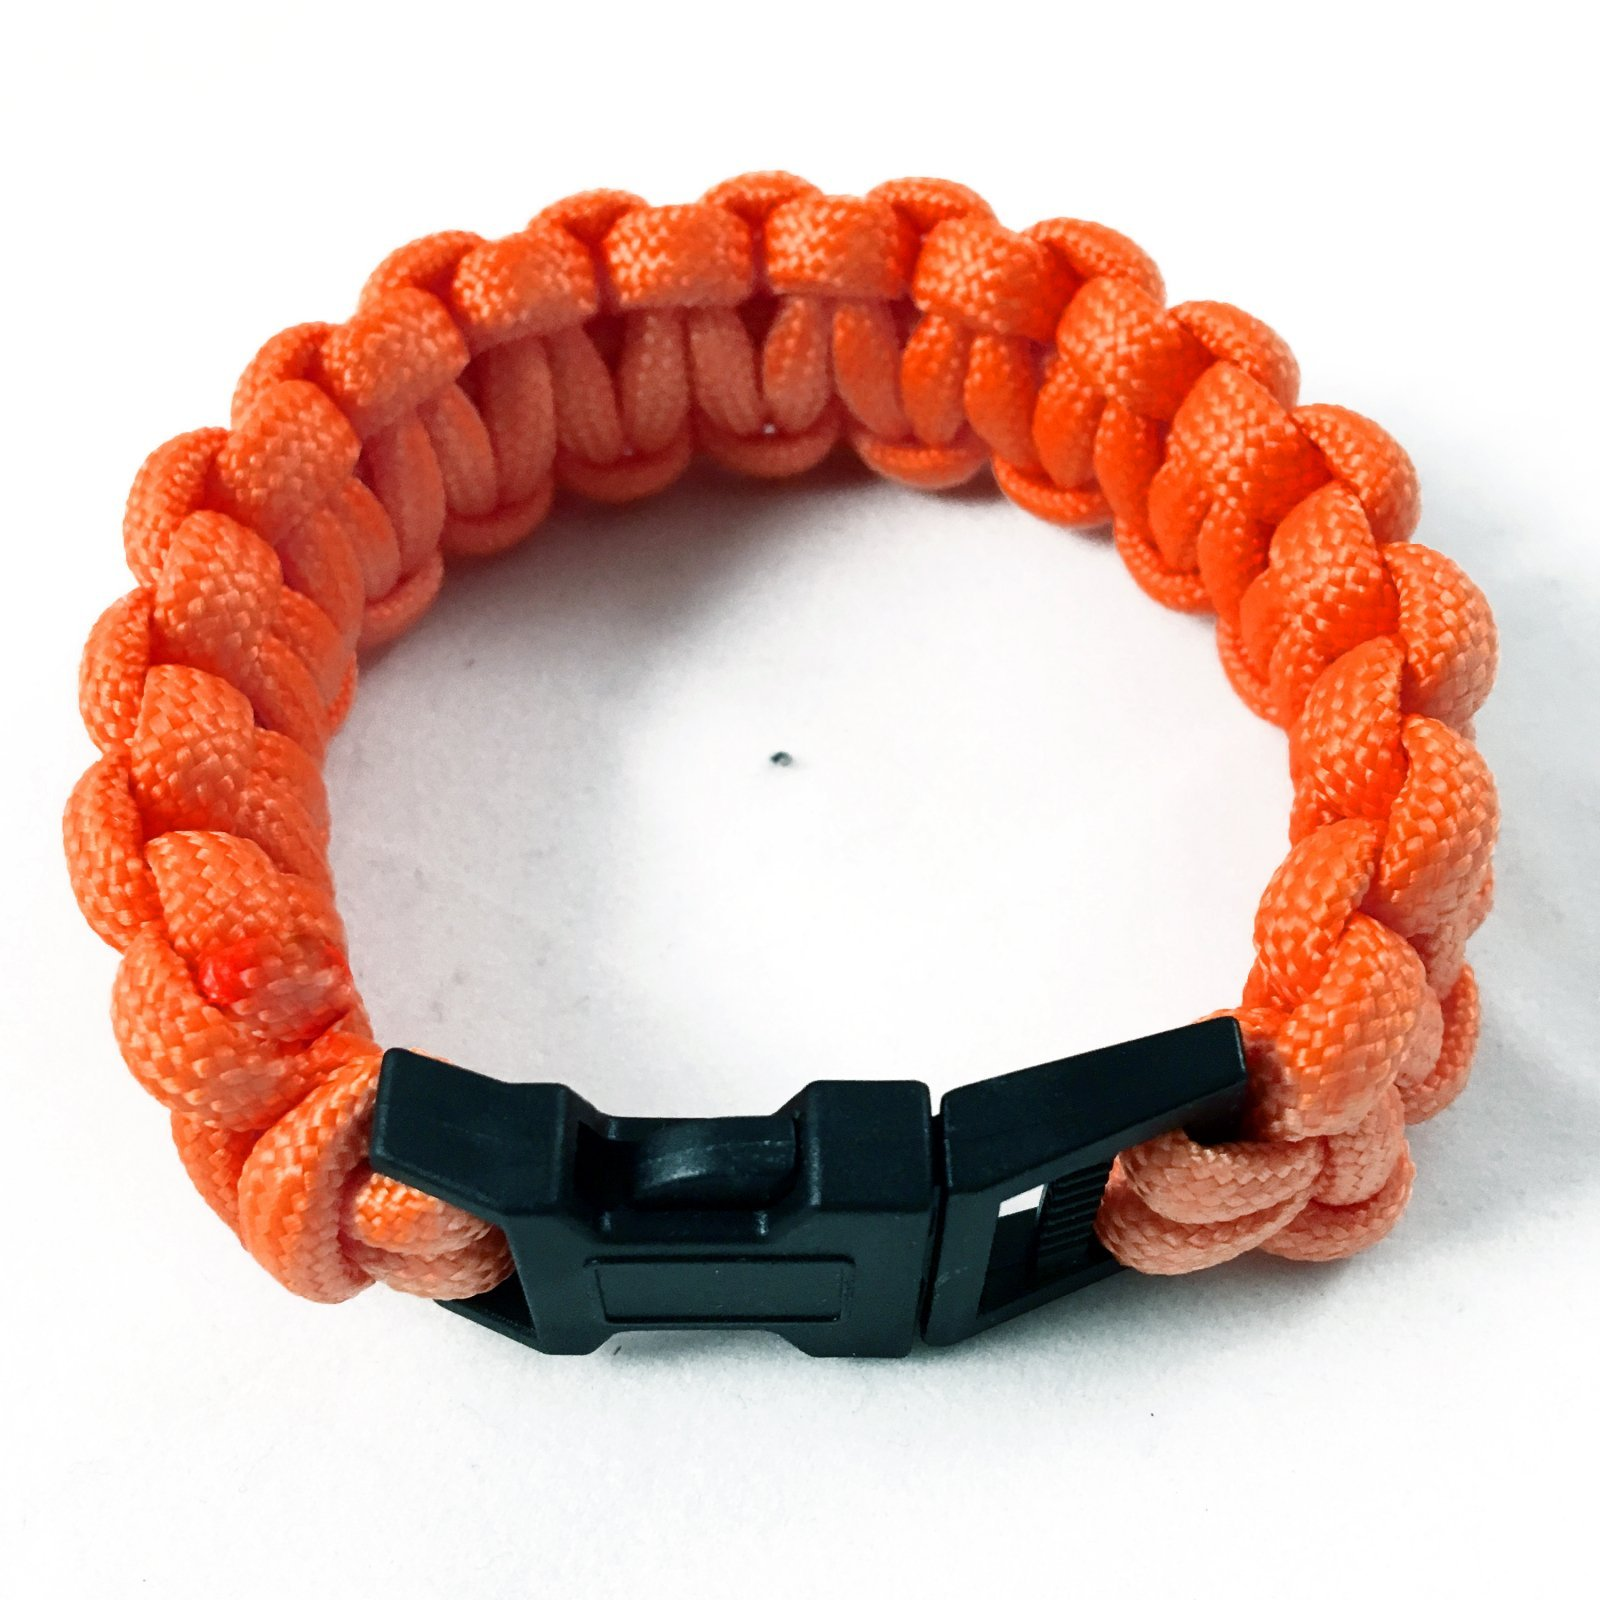 ASR Outdoor - Paracord Bracelet - Orange